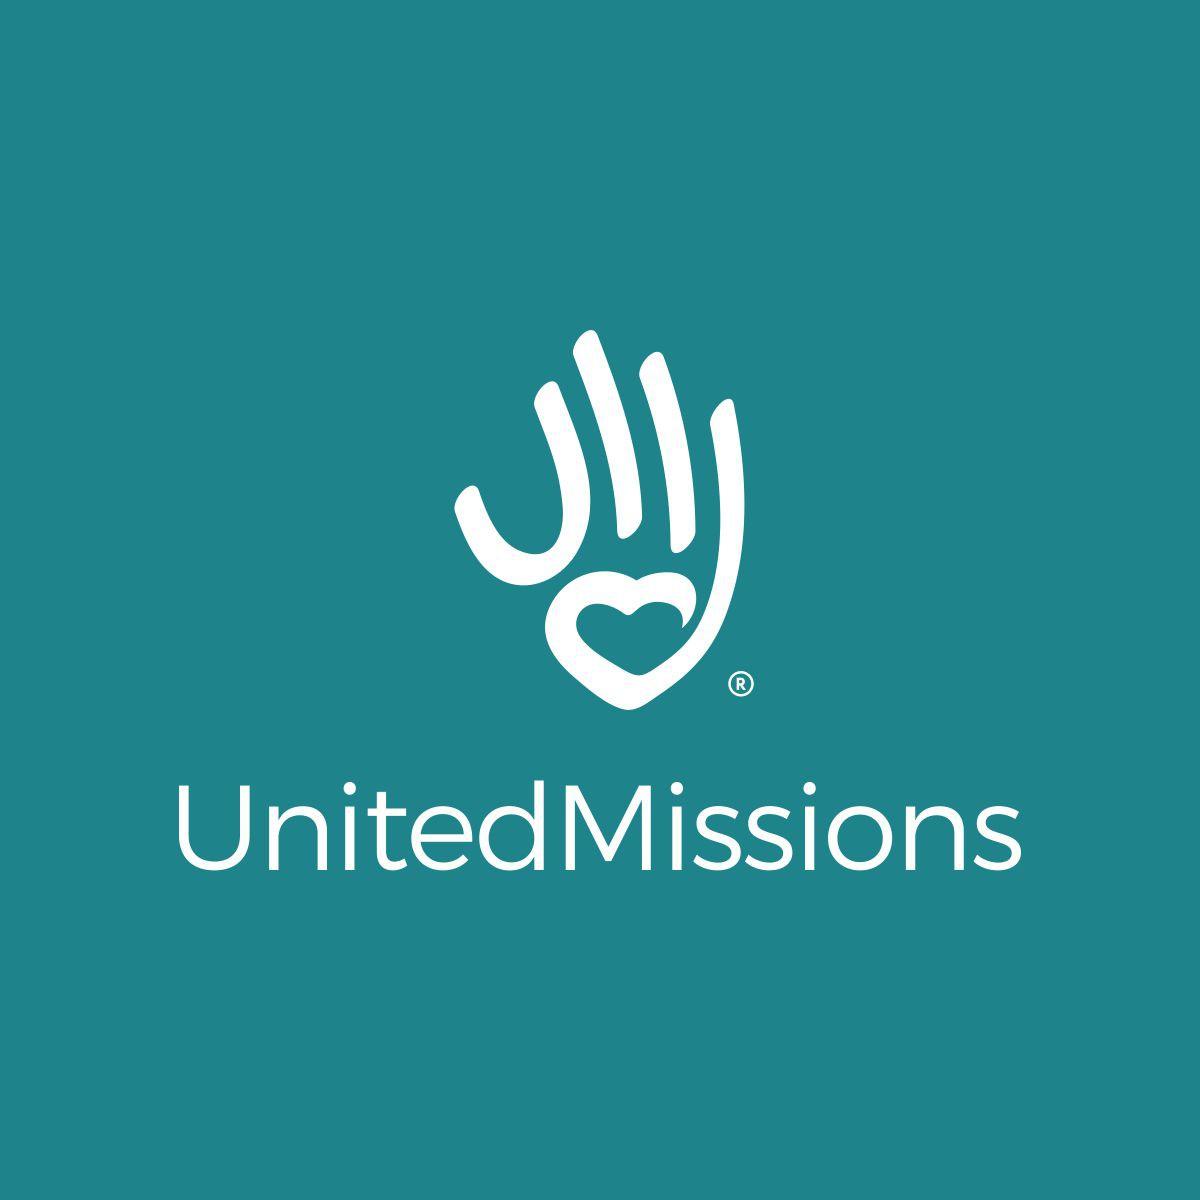 United Missions Seeks Warm, Organic, Friendly, Hope-Filled Logo for Refugee Aid Initiative